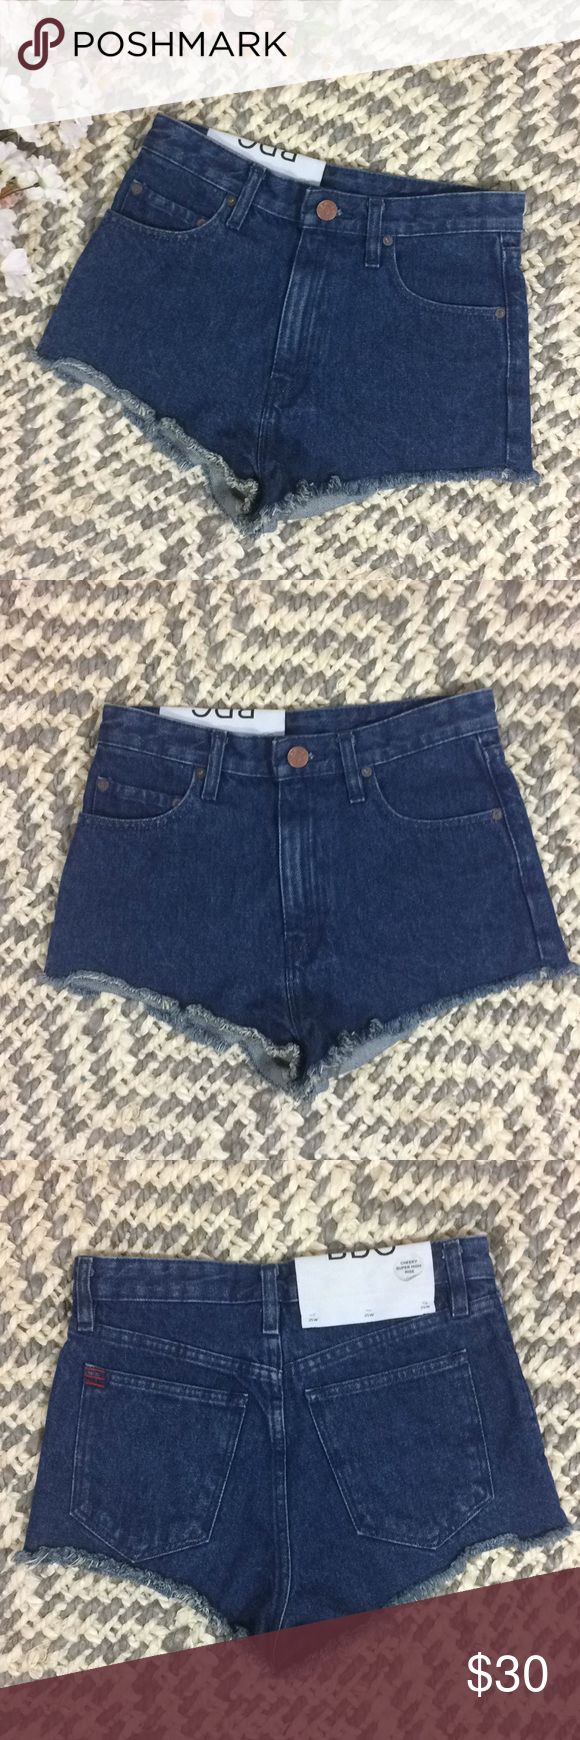 "Urban Outfitters | BDG Cheeky High Rise Shorts 25 NWT Urban Outfitters Cheeky High Rises Denim Jean Shorts Sz 24w  Waist: 14"" Length: 10.5""  Happy shopping! BDG Shorts Jean Shorts"